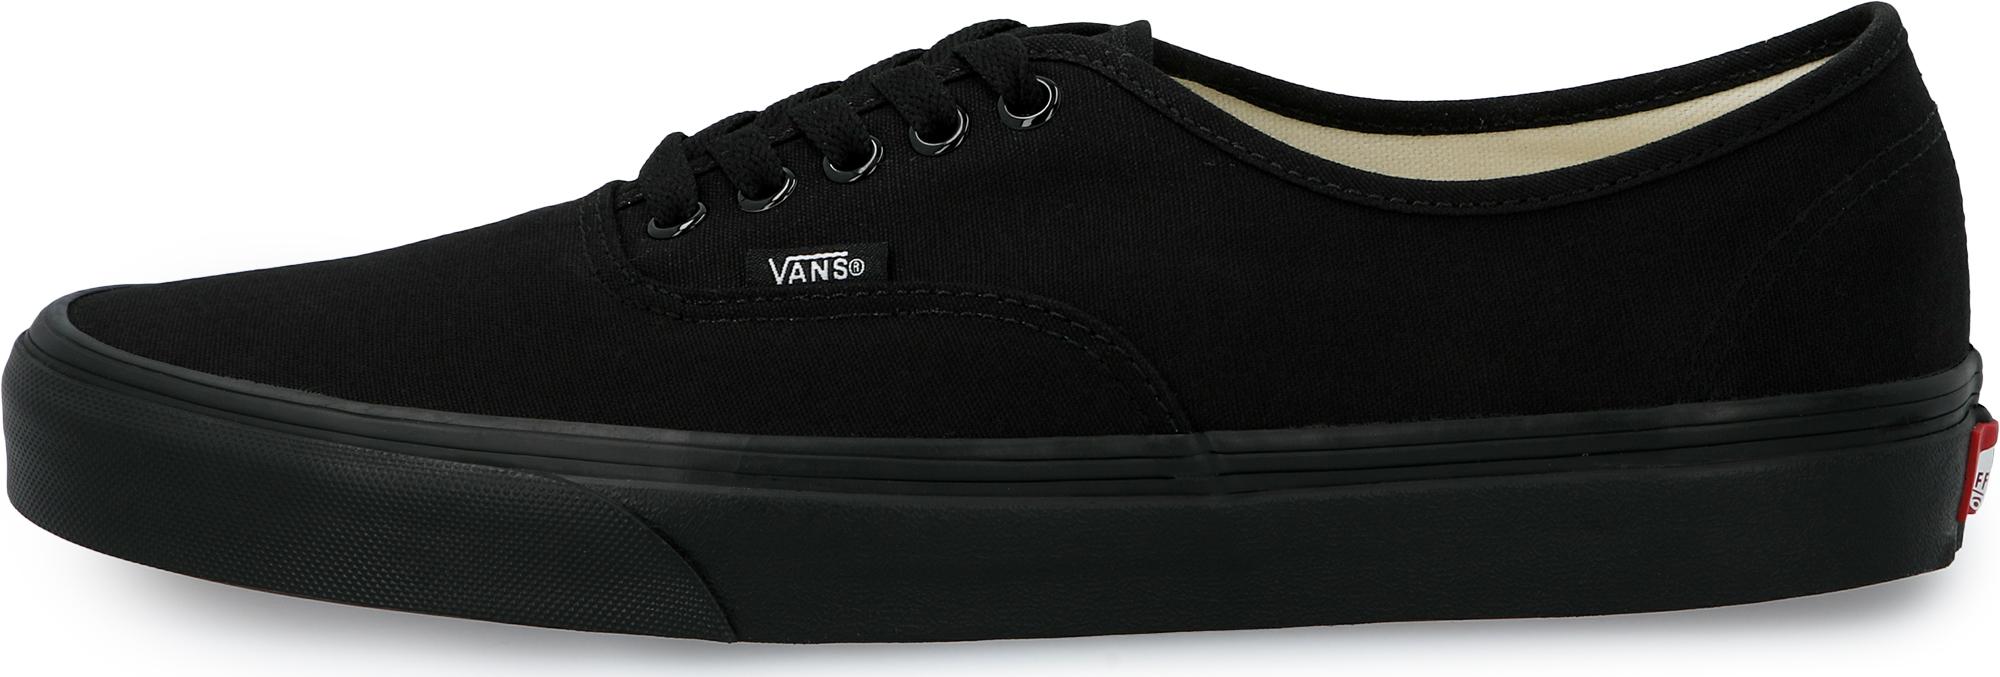 Vans Кеды мужские Vans Authentic, размер 42 кеды vans vans va984auajyf8